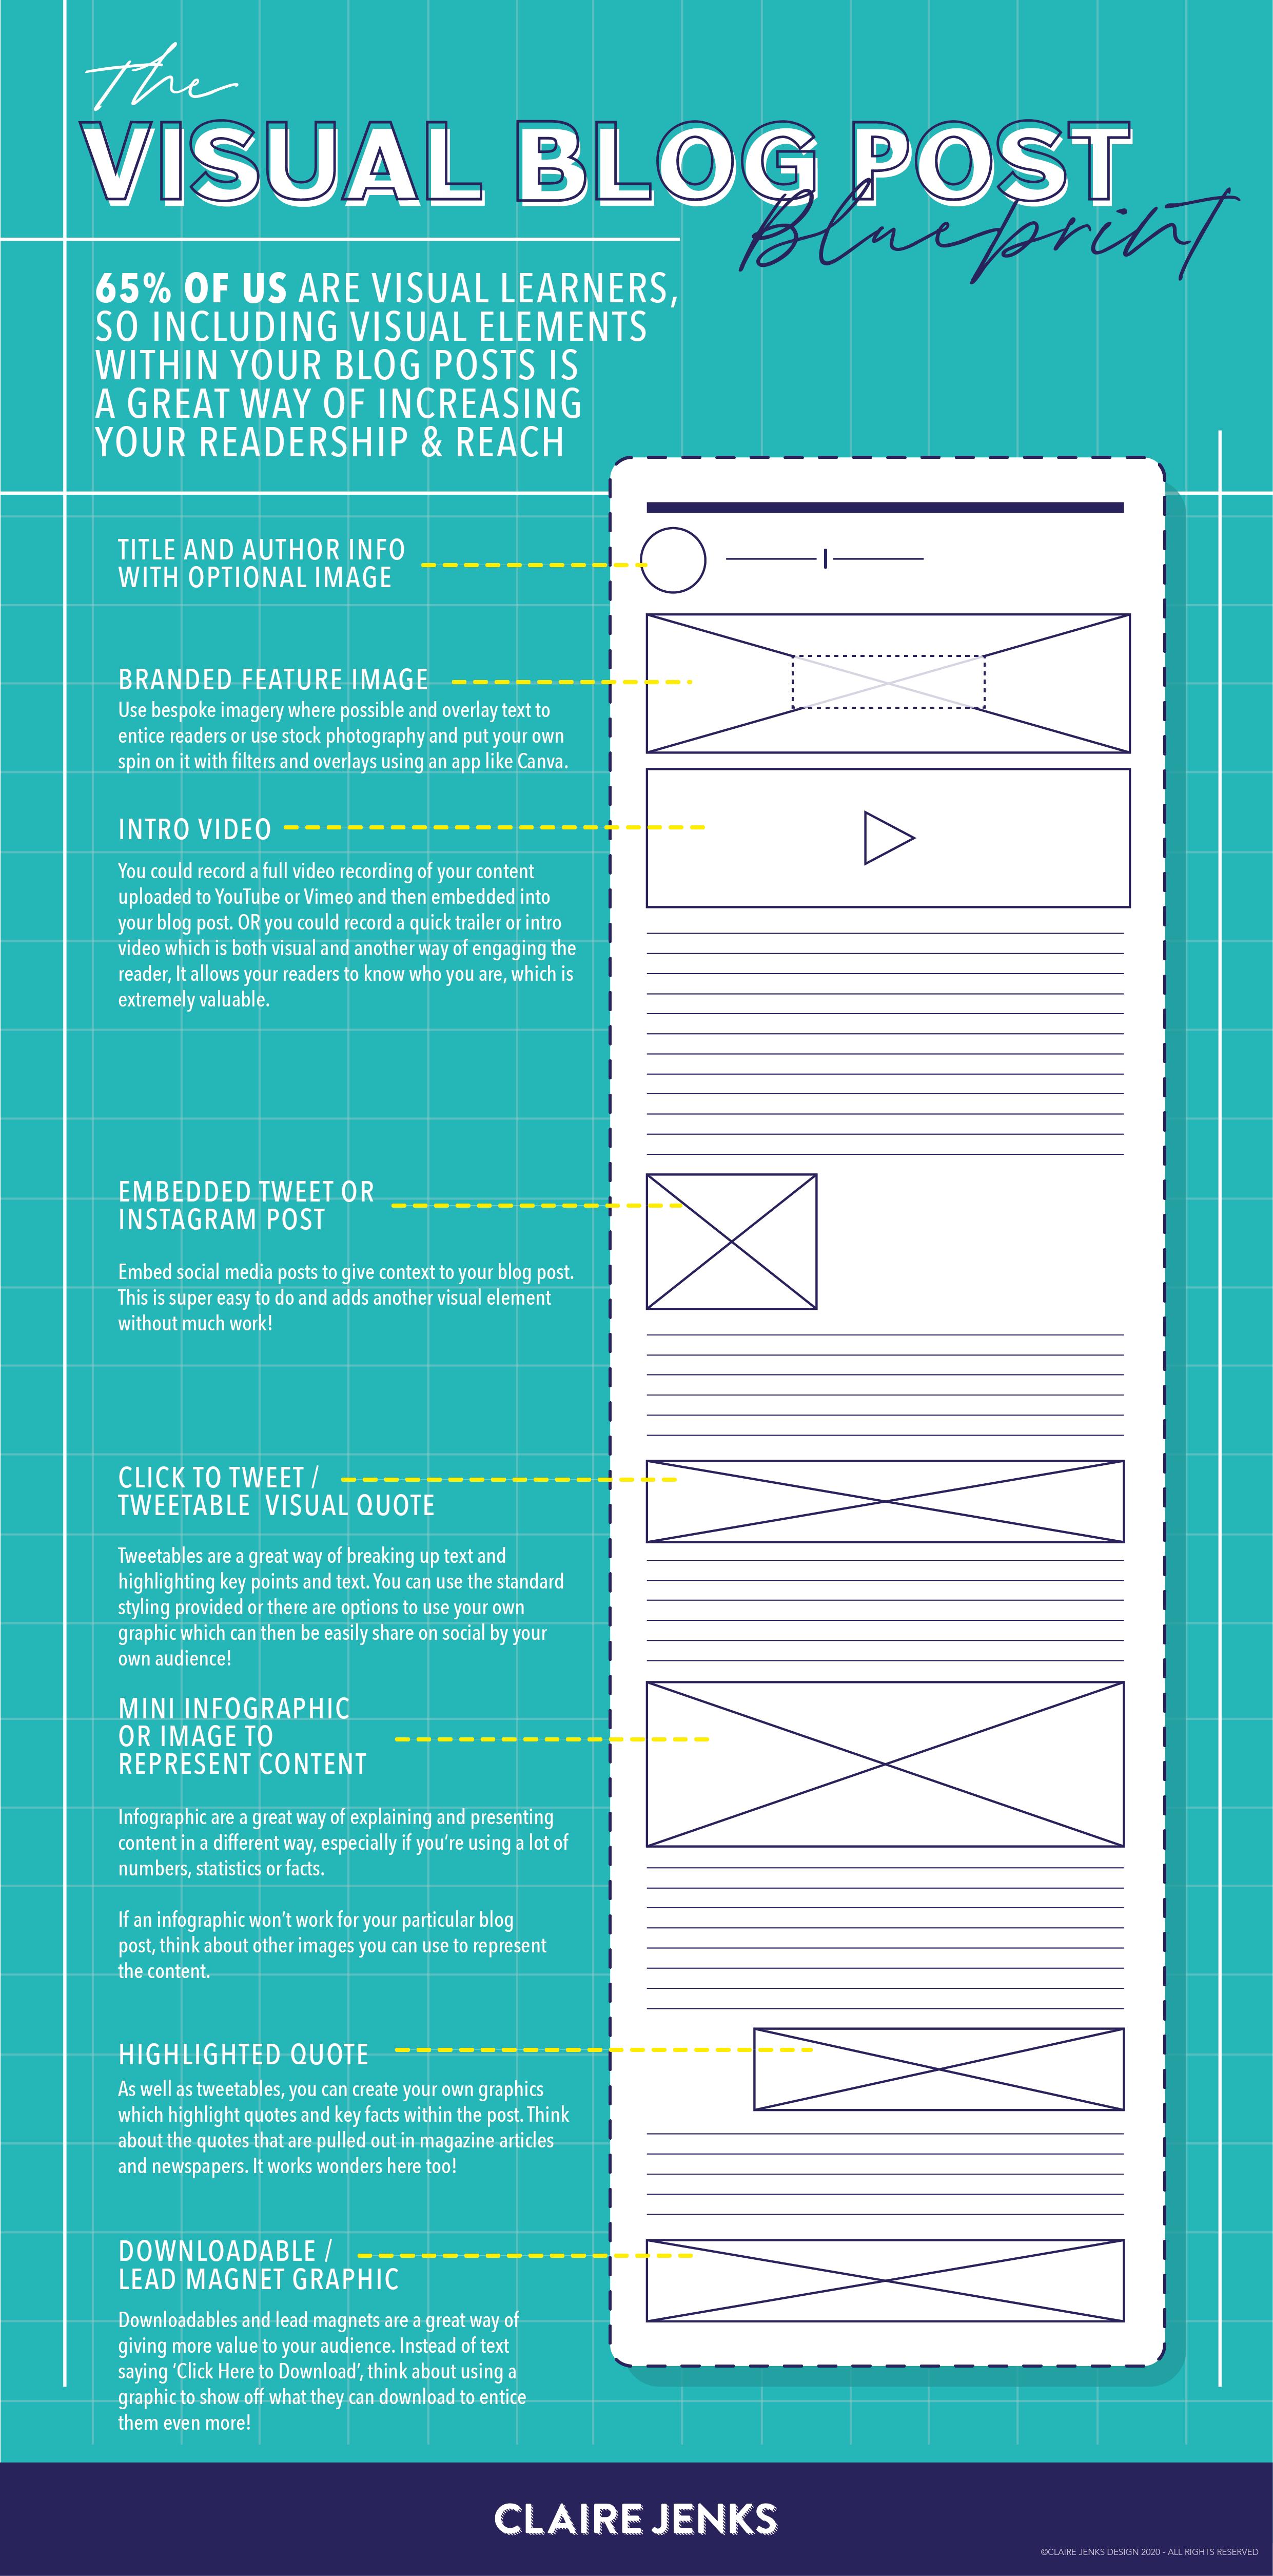 The Visual Blog Post Blueprint-Claire Jenks Design